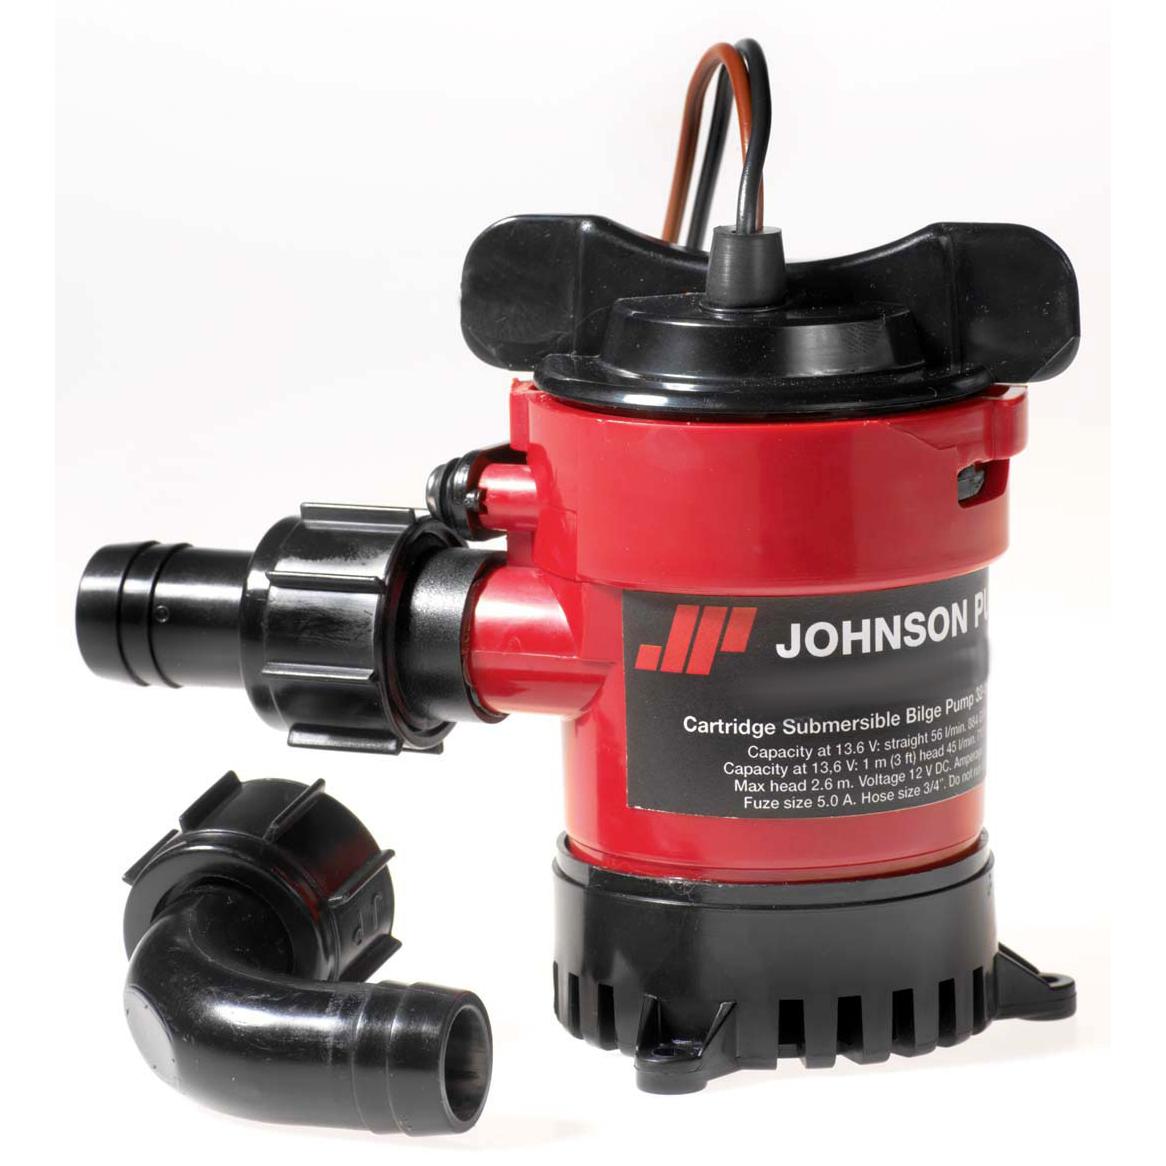 Johnson Cartridge Bilge Pump, 500 GPH photo